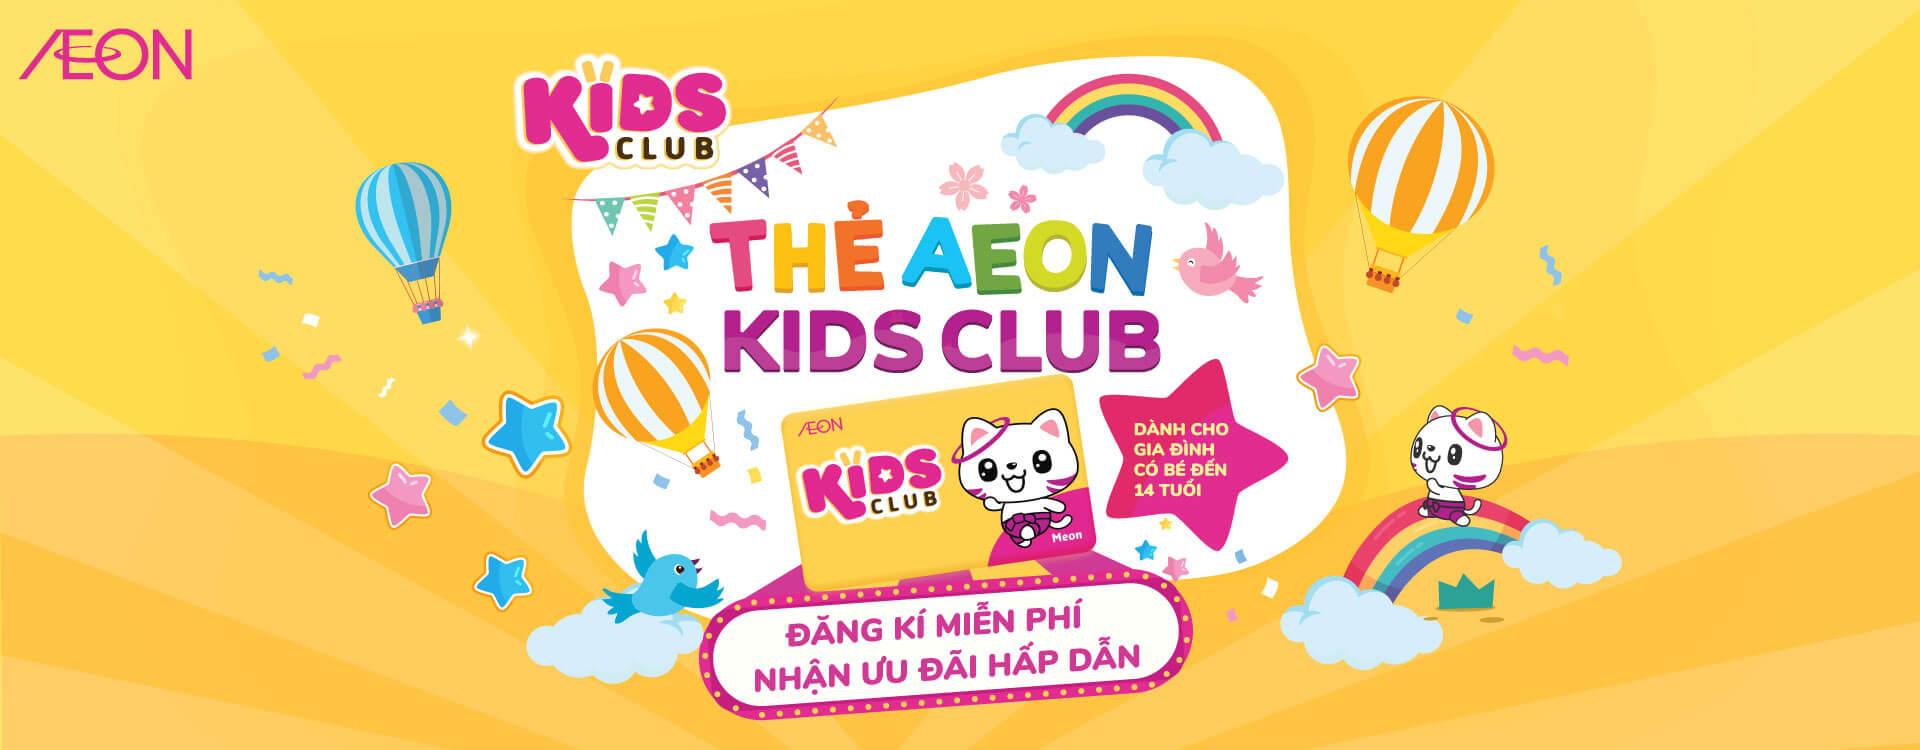 Thẻ Aeon Kids Club